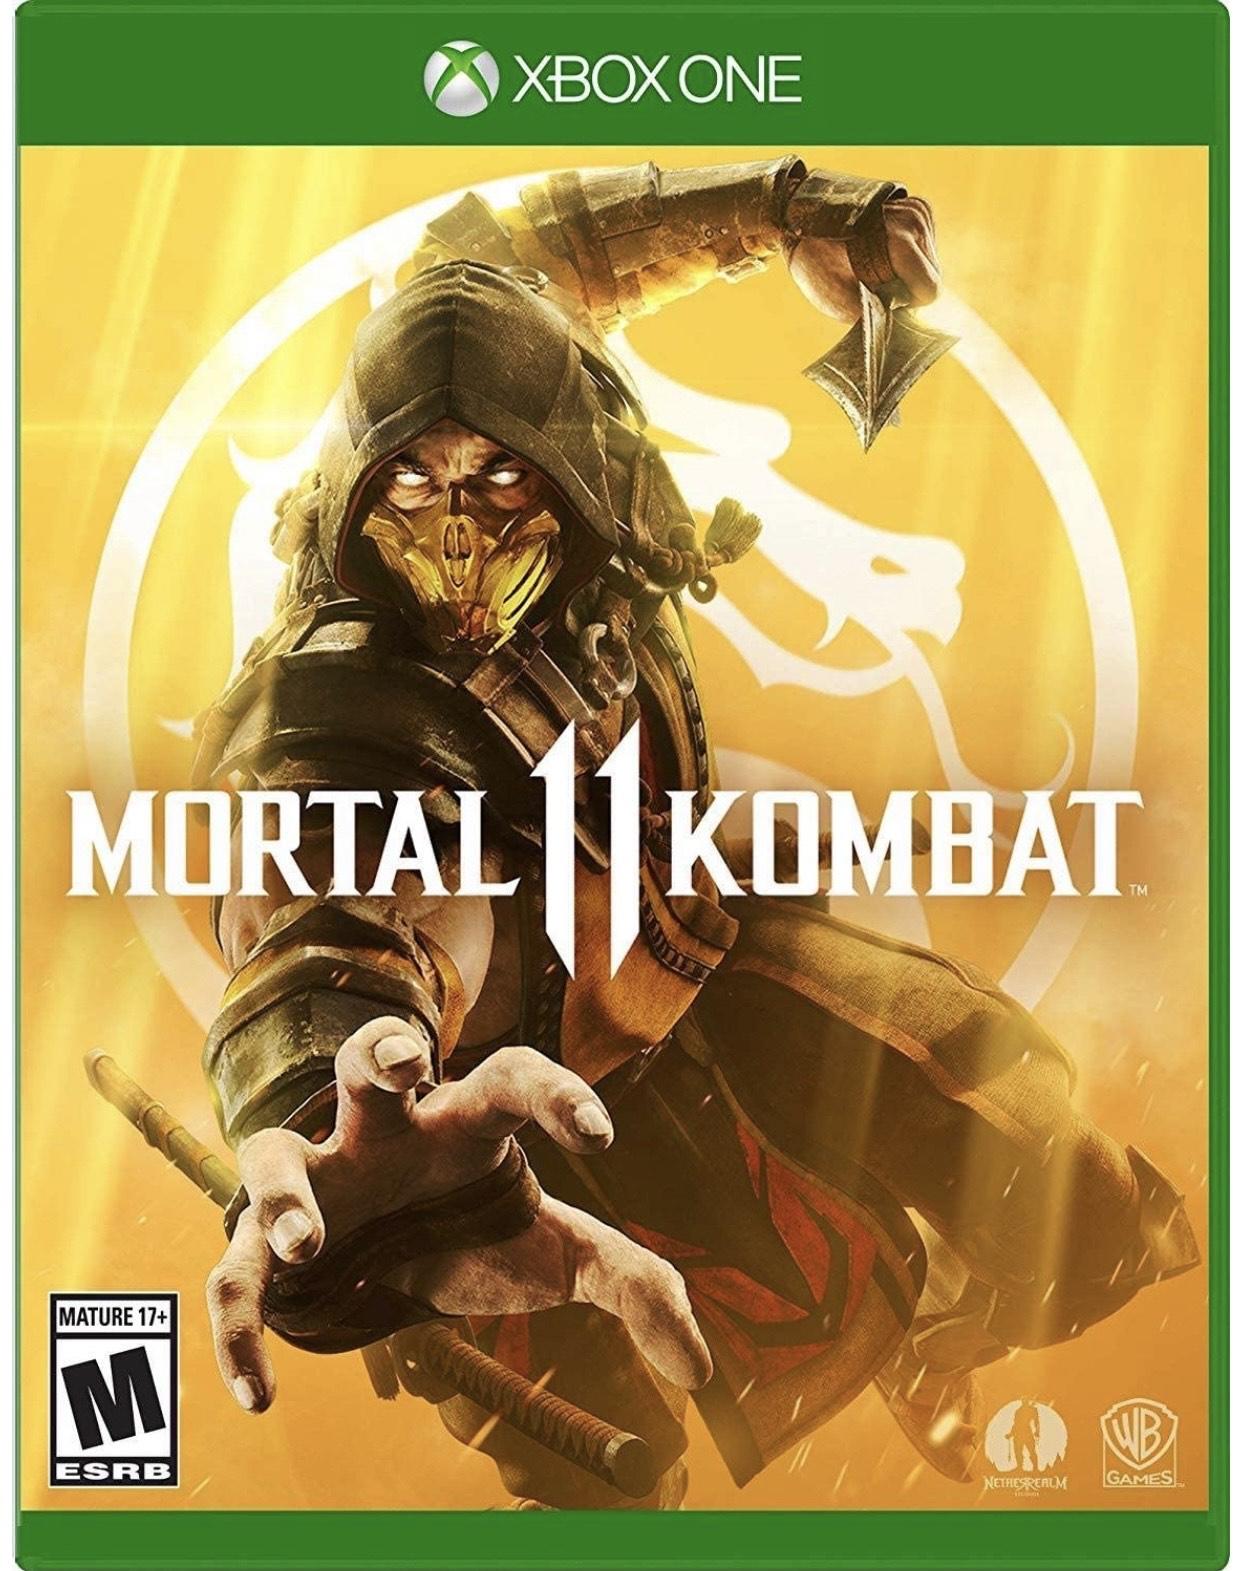 Amazon: Mortal Kombat 11 - Xbox One Standard Edition